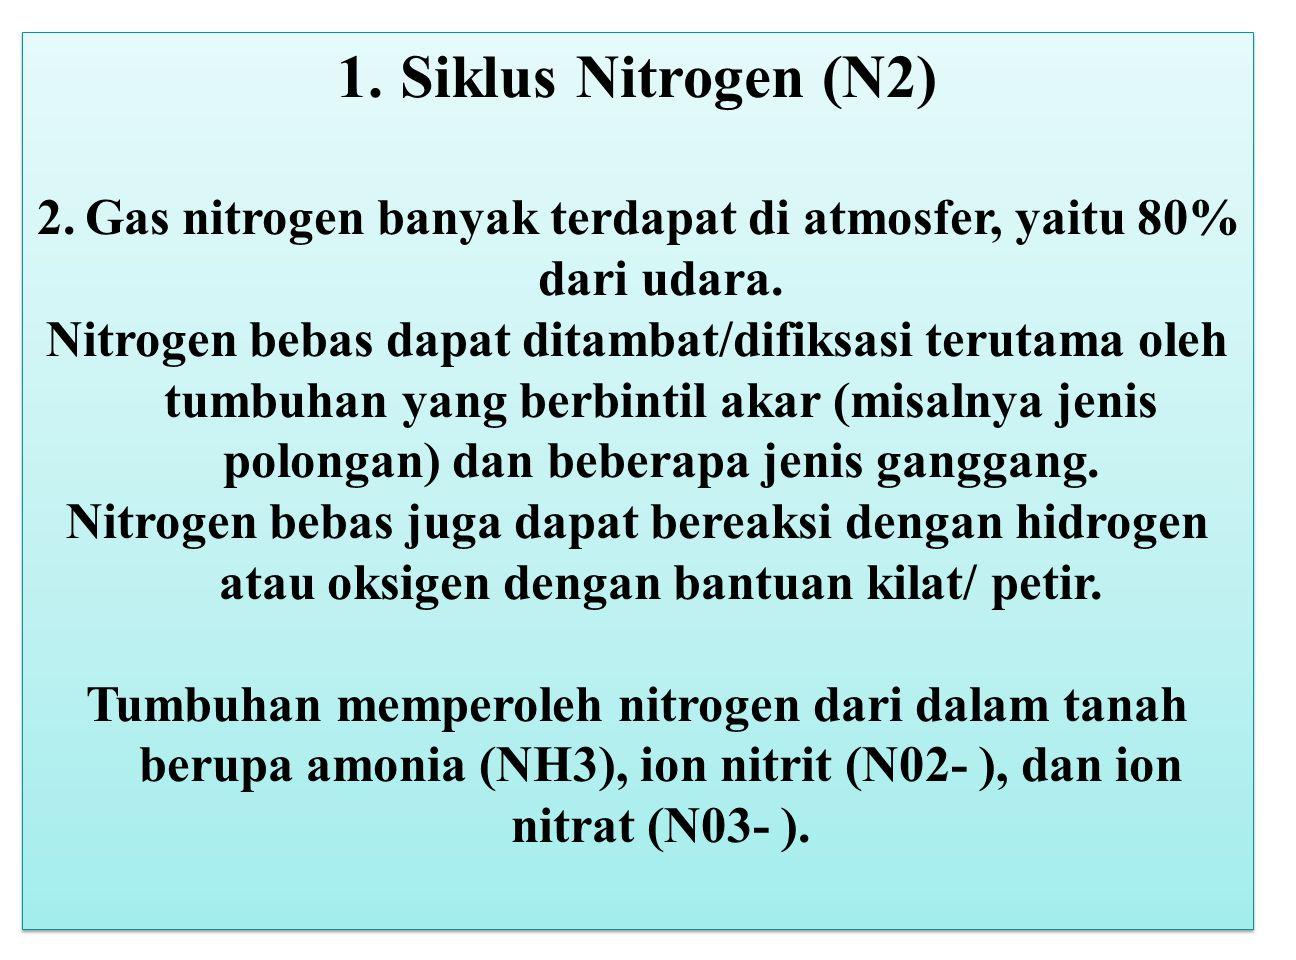 1. Siklus Nitrogen (N2) 2.Gas nitrogen banyak terdapat di atmosfer, yaitu 80% dari udara. Nitrogen bebas dapat ditambat/difiksasi terutama oleh tumbuh